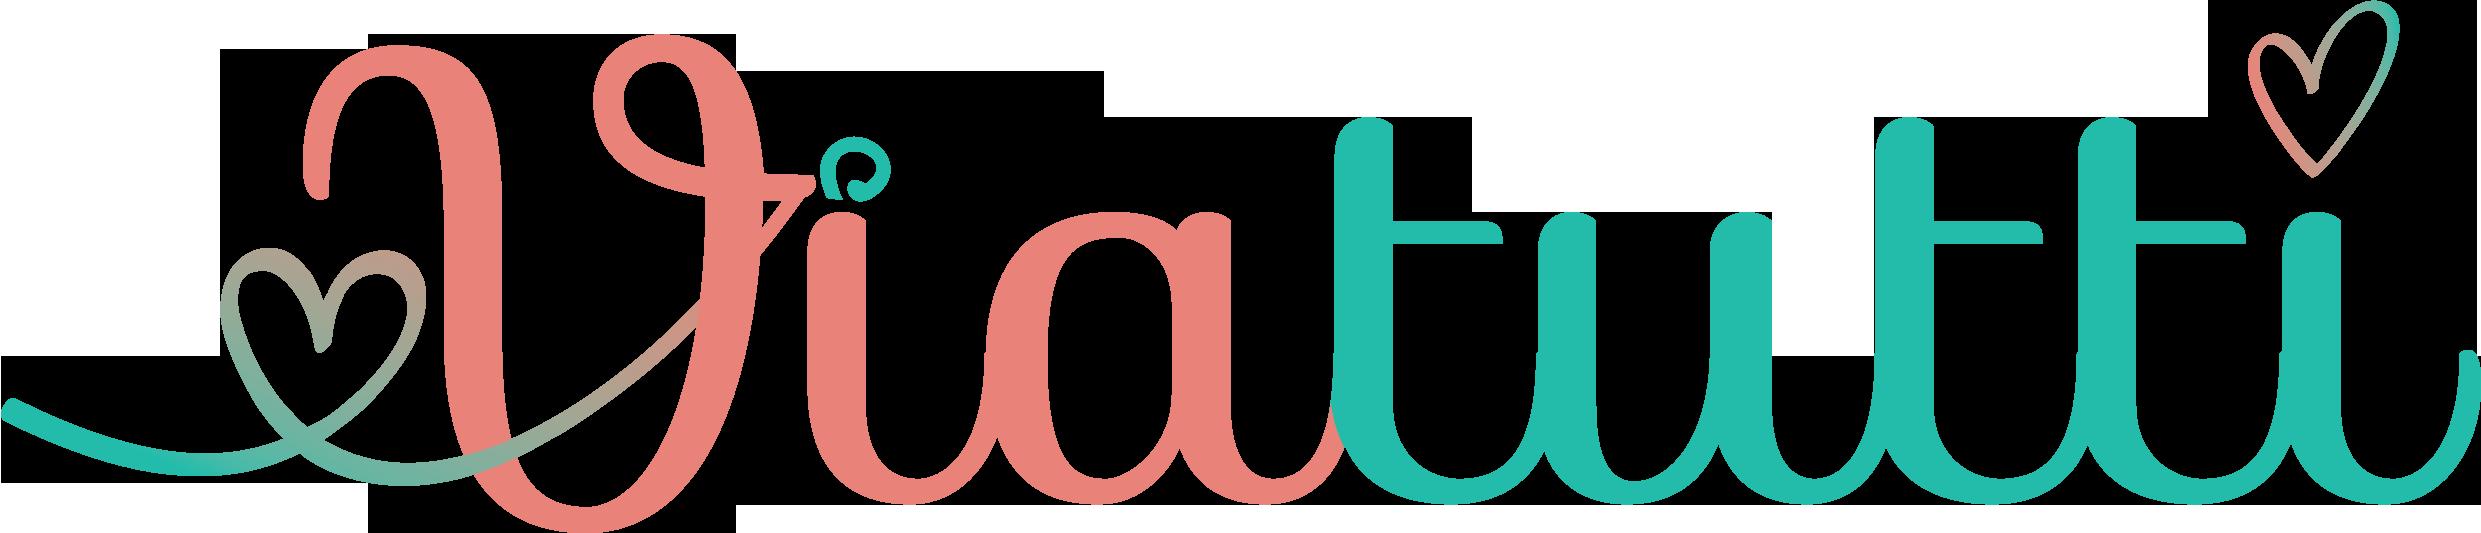 ViaTutti